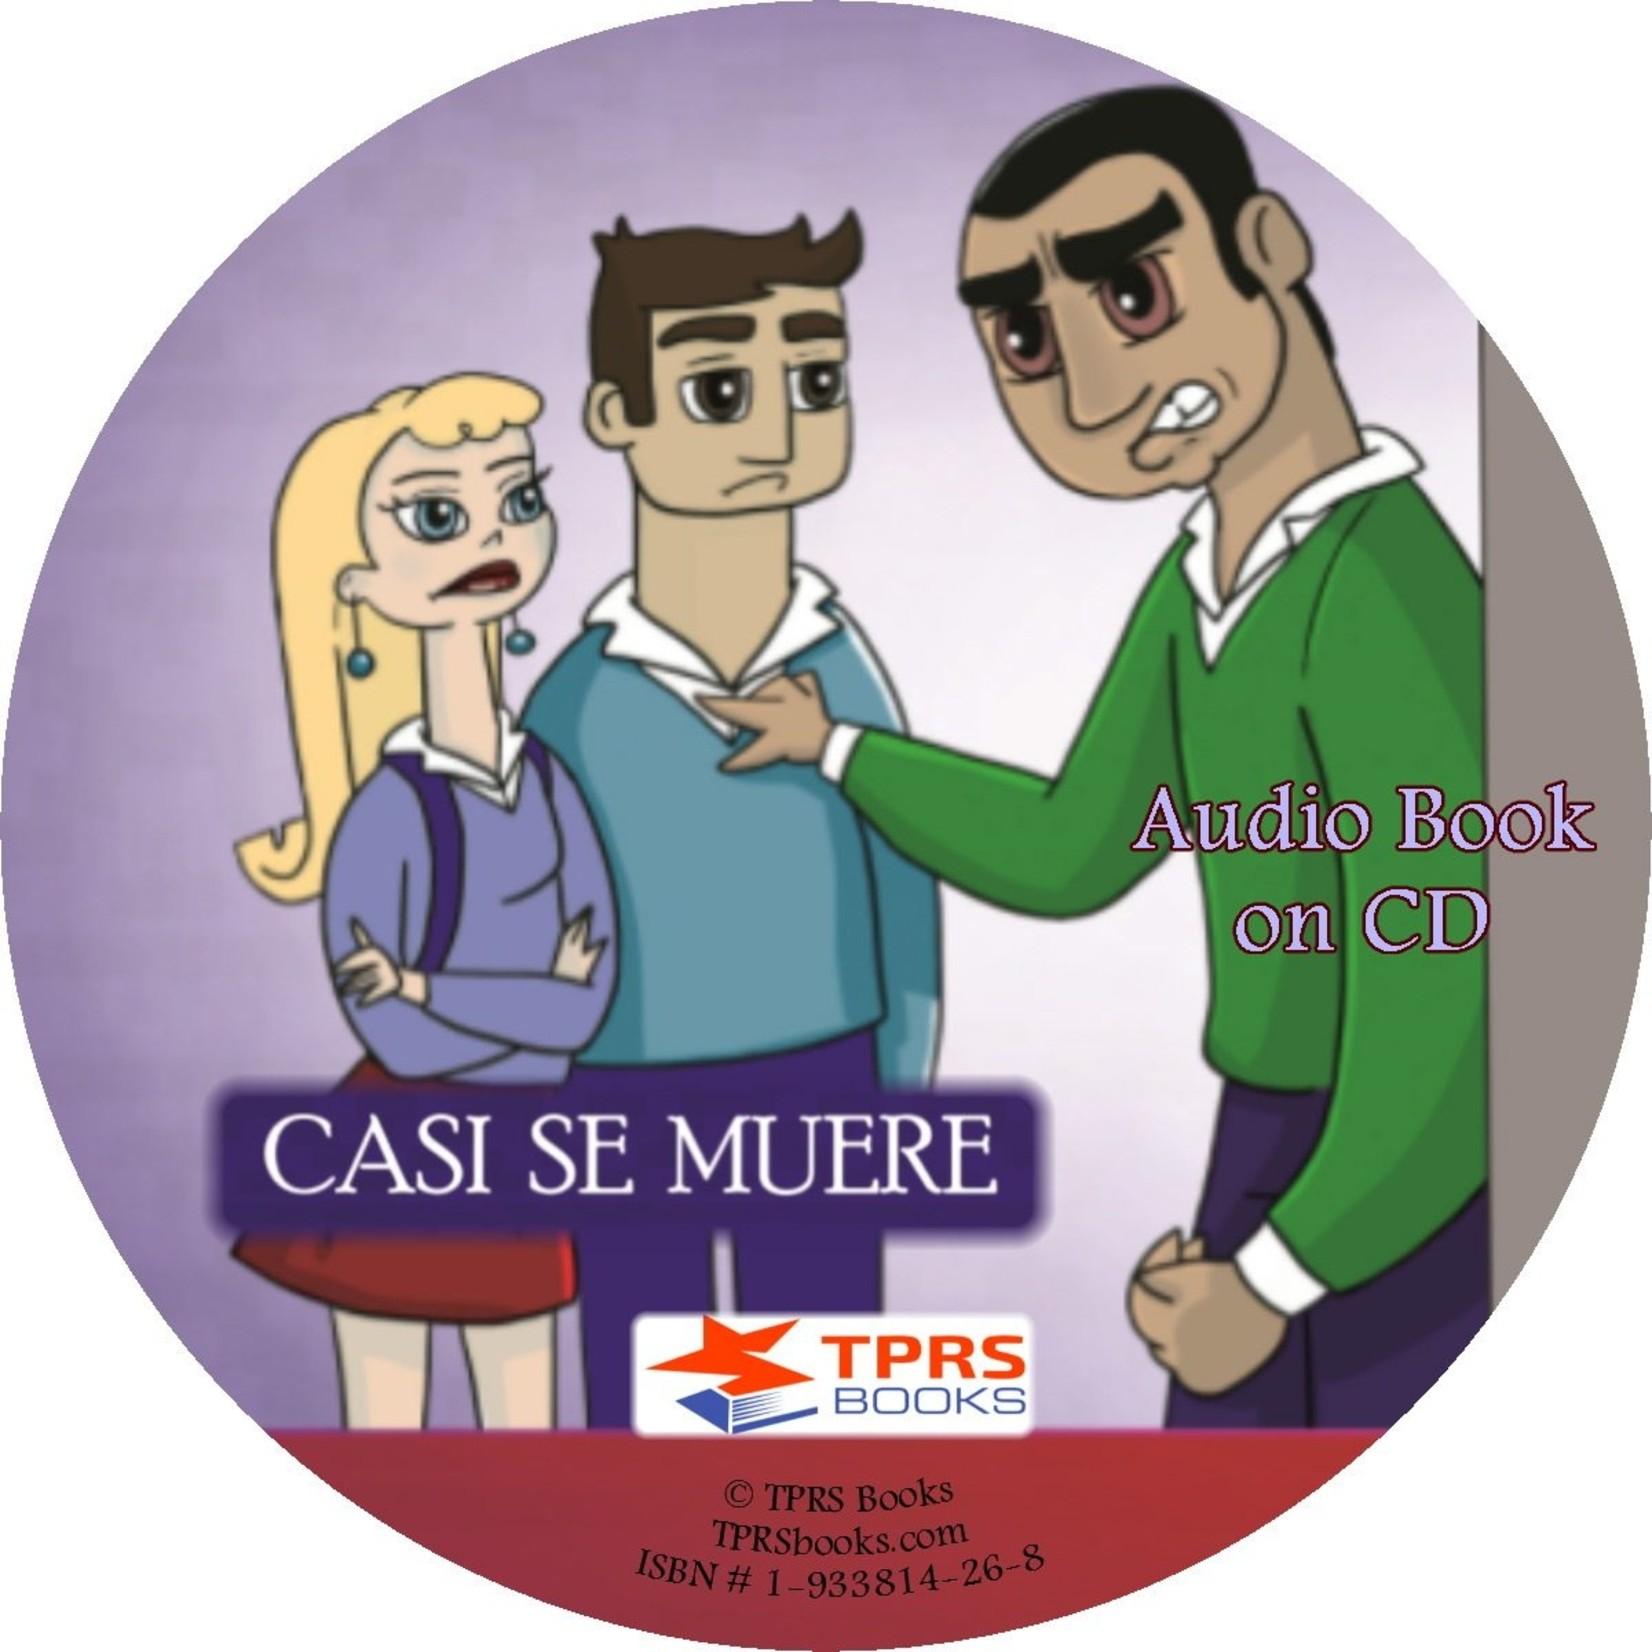 TPRS Books Casi se muere - Audiobook